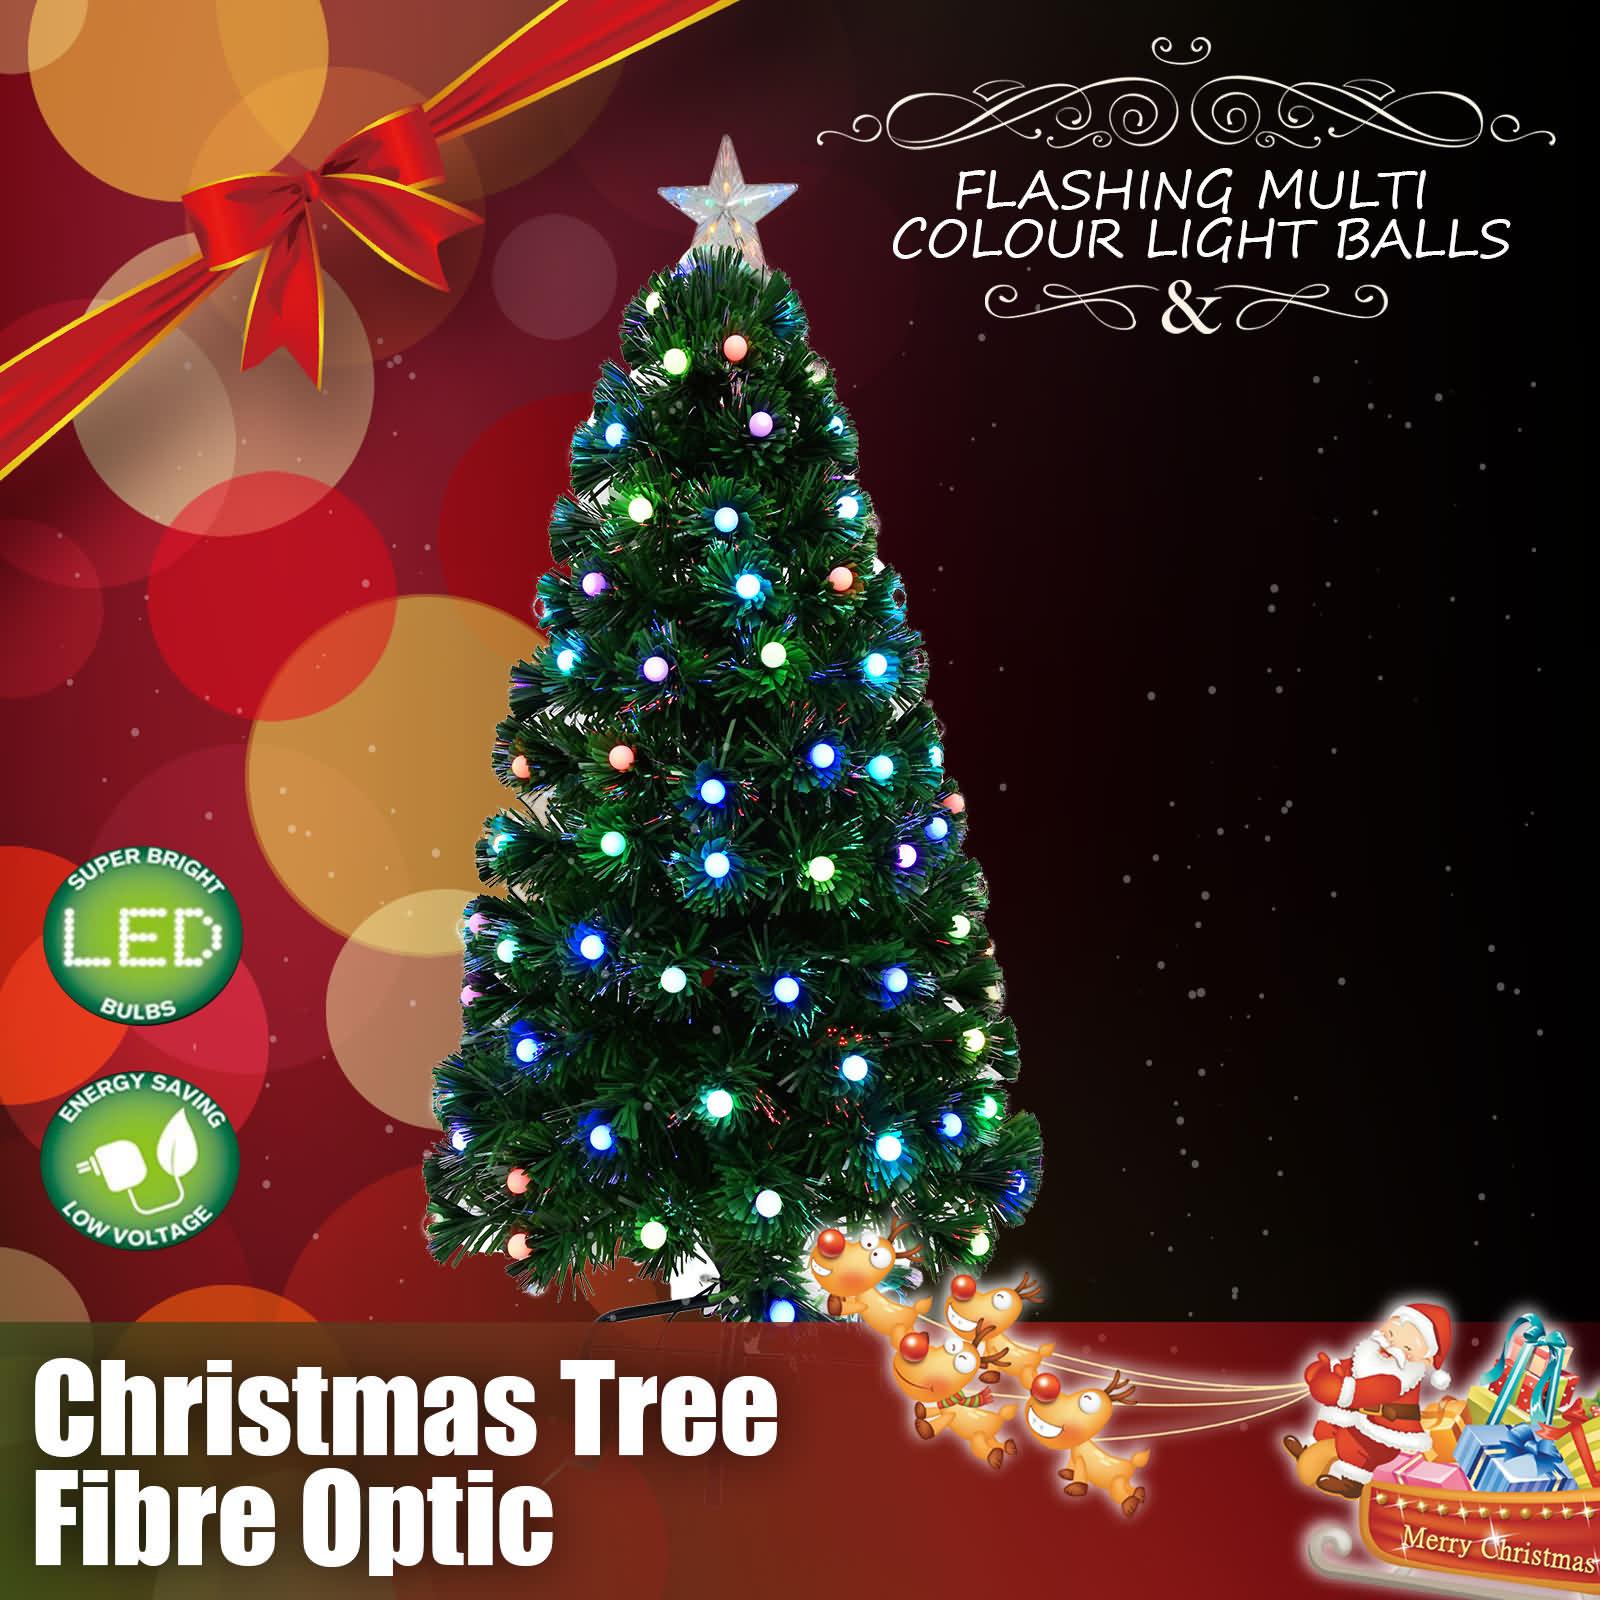 Christmas Light Balls.Details About Christmas Lights Tree 130pc Led Xmas Light Fibre Optic Multi Flashing Balls 4ft